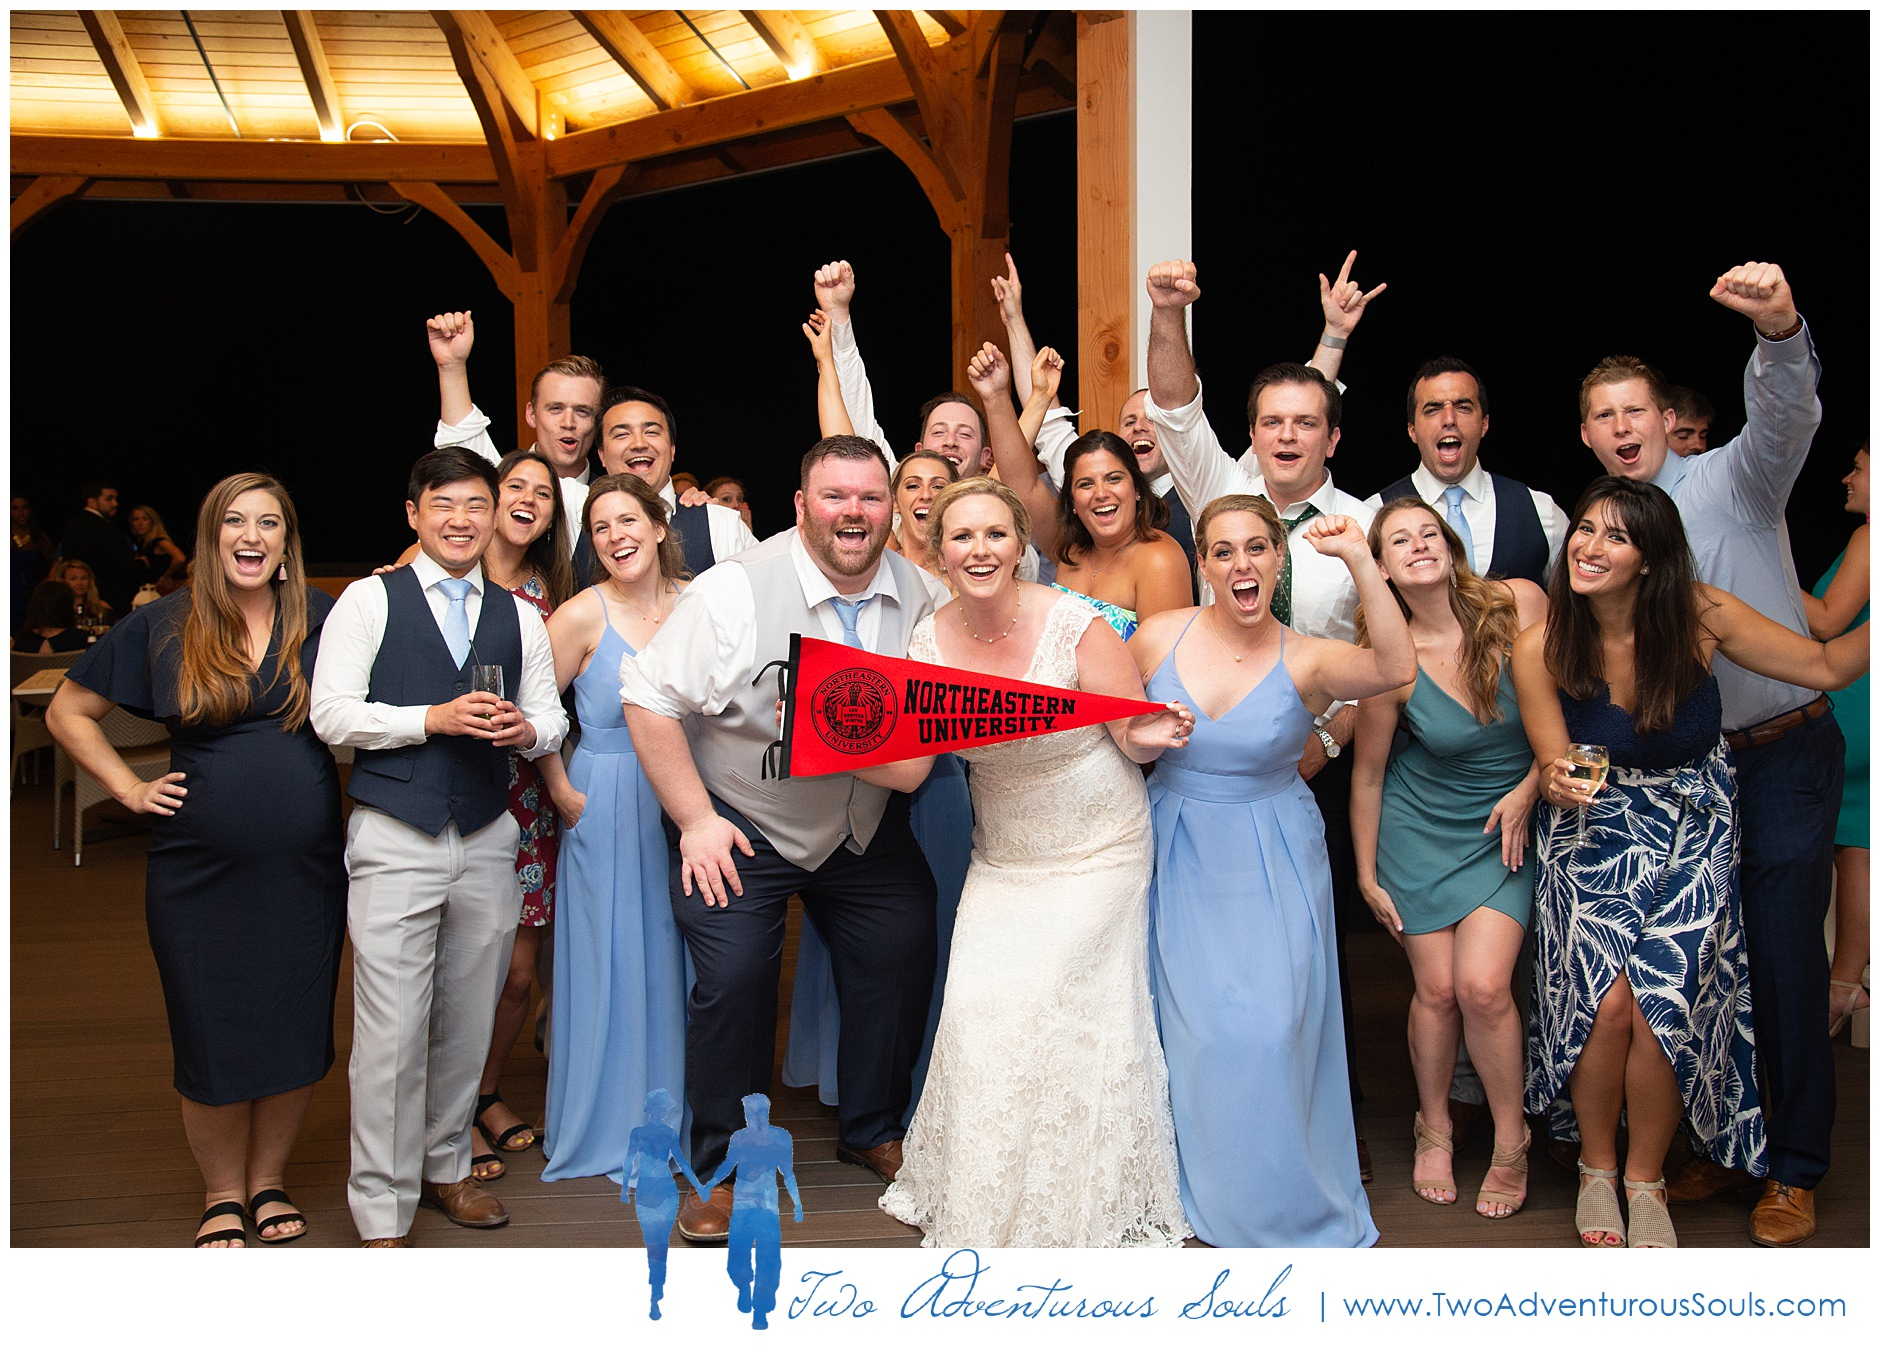 Cape Cod Wedding Photographers, Destination Wedding Photographers, Two Adventurous Souls-081019_0049.jpg